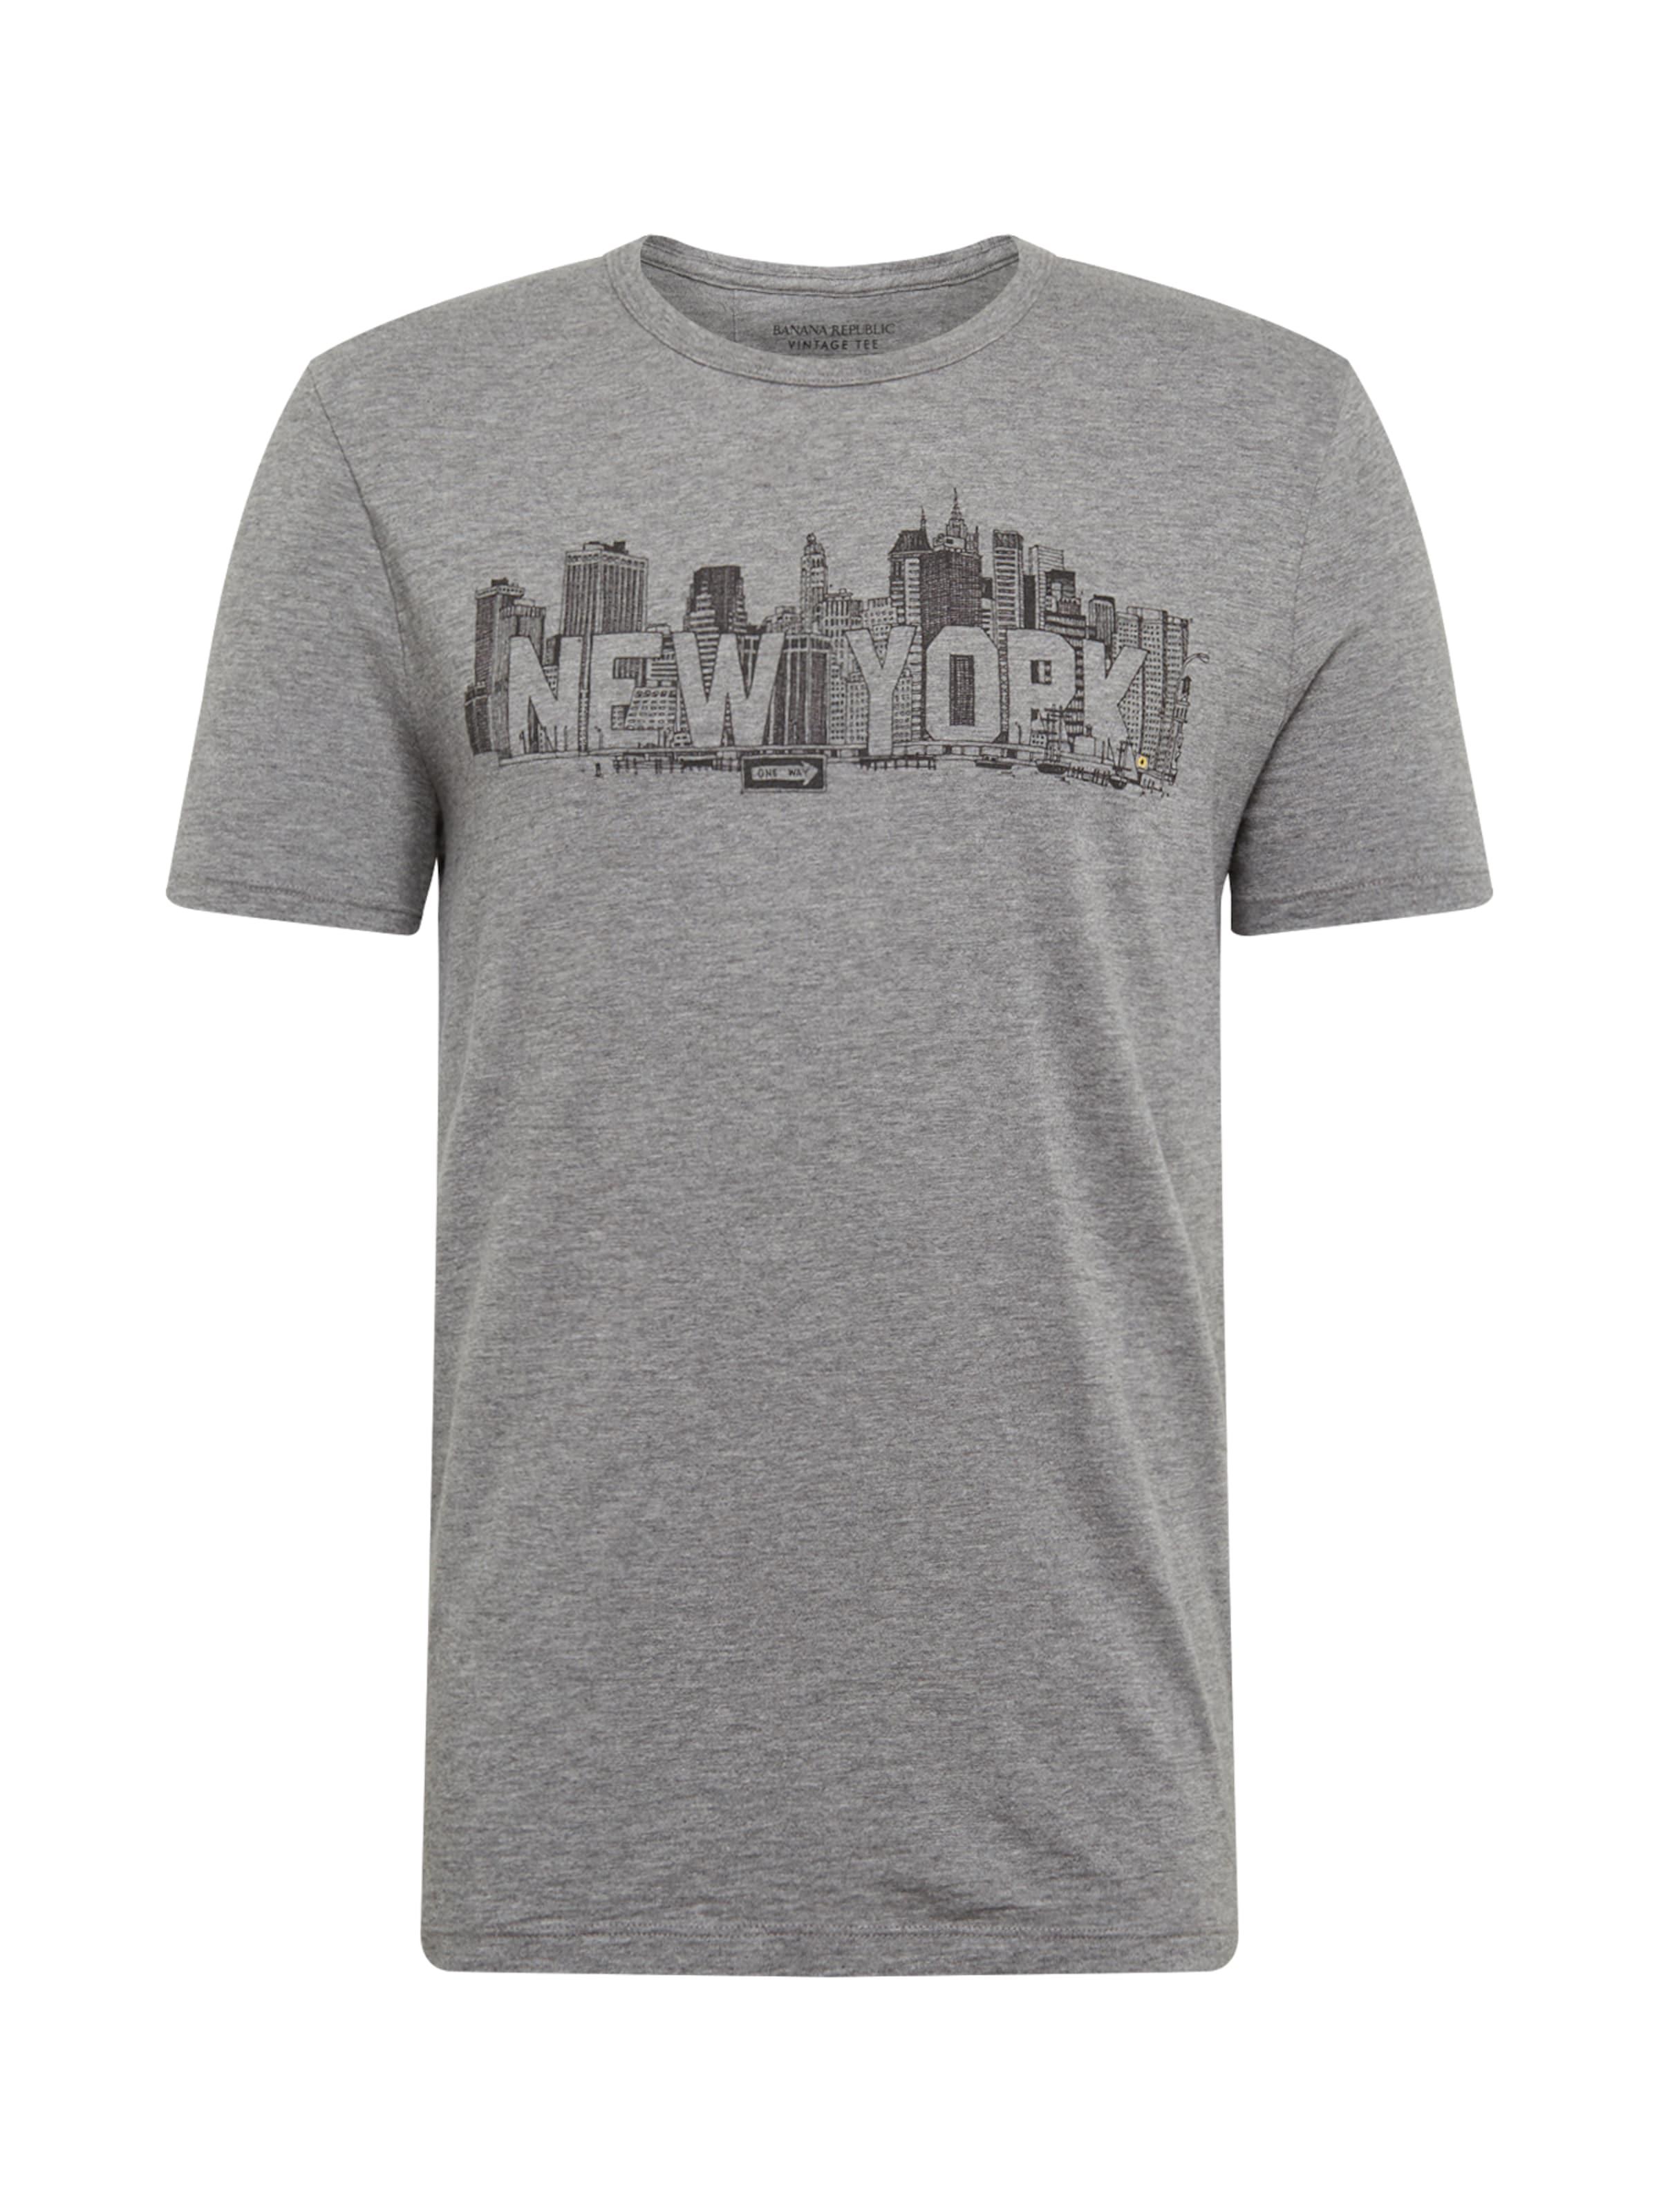 Banana 'location York New Tee' Shirt Grau Graphic In Republic Ivb6gY7mfy